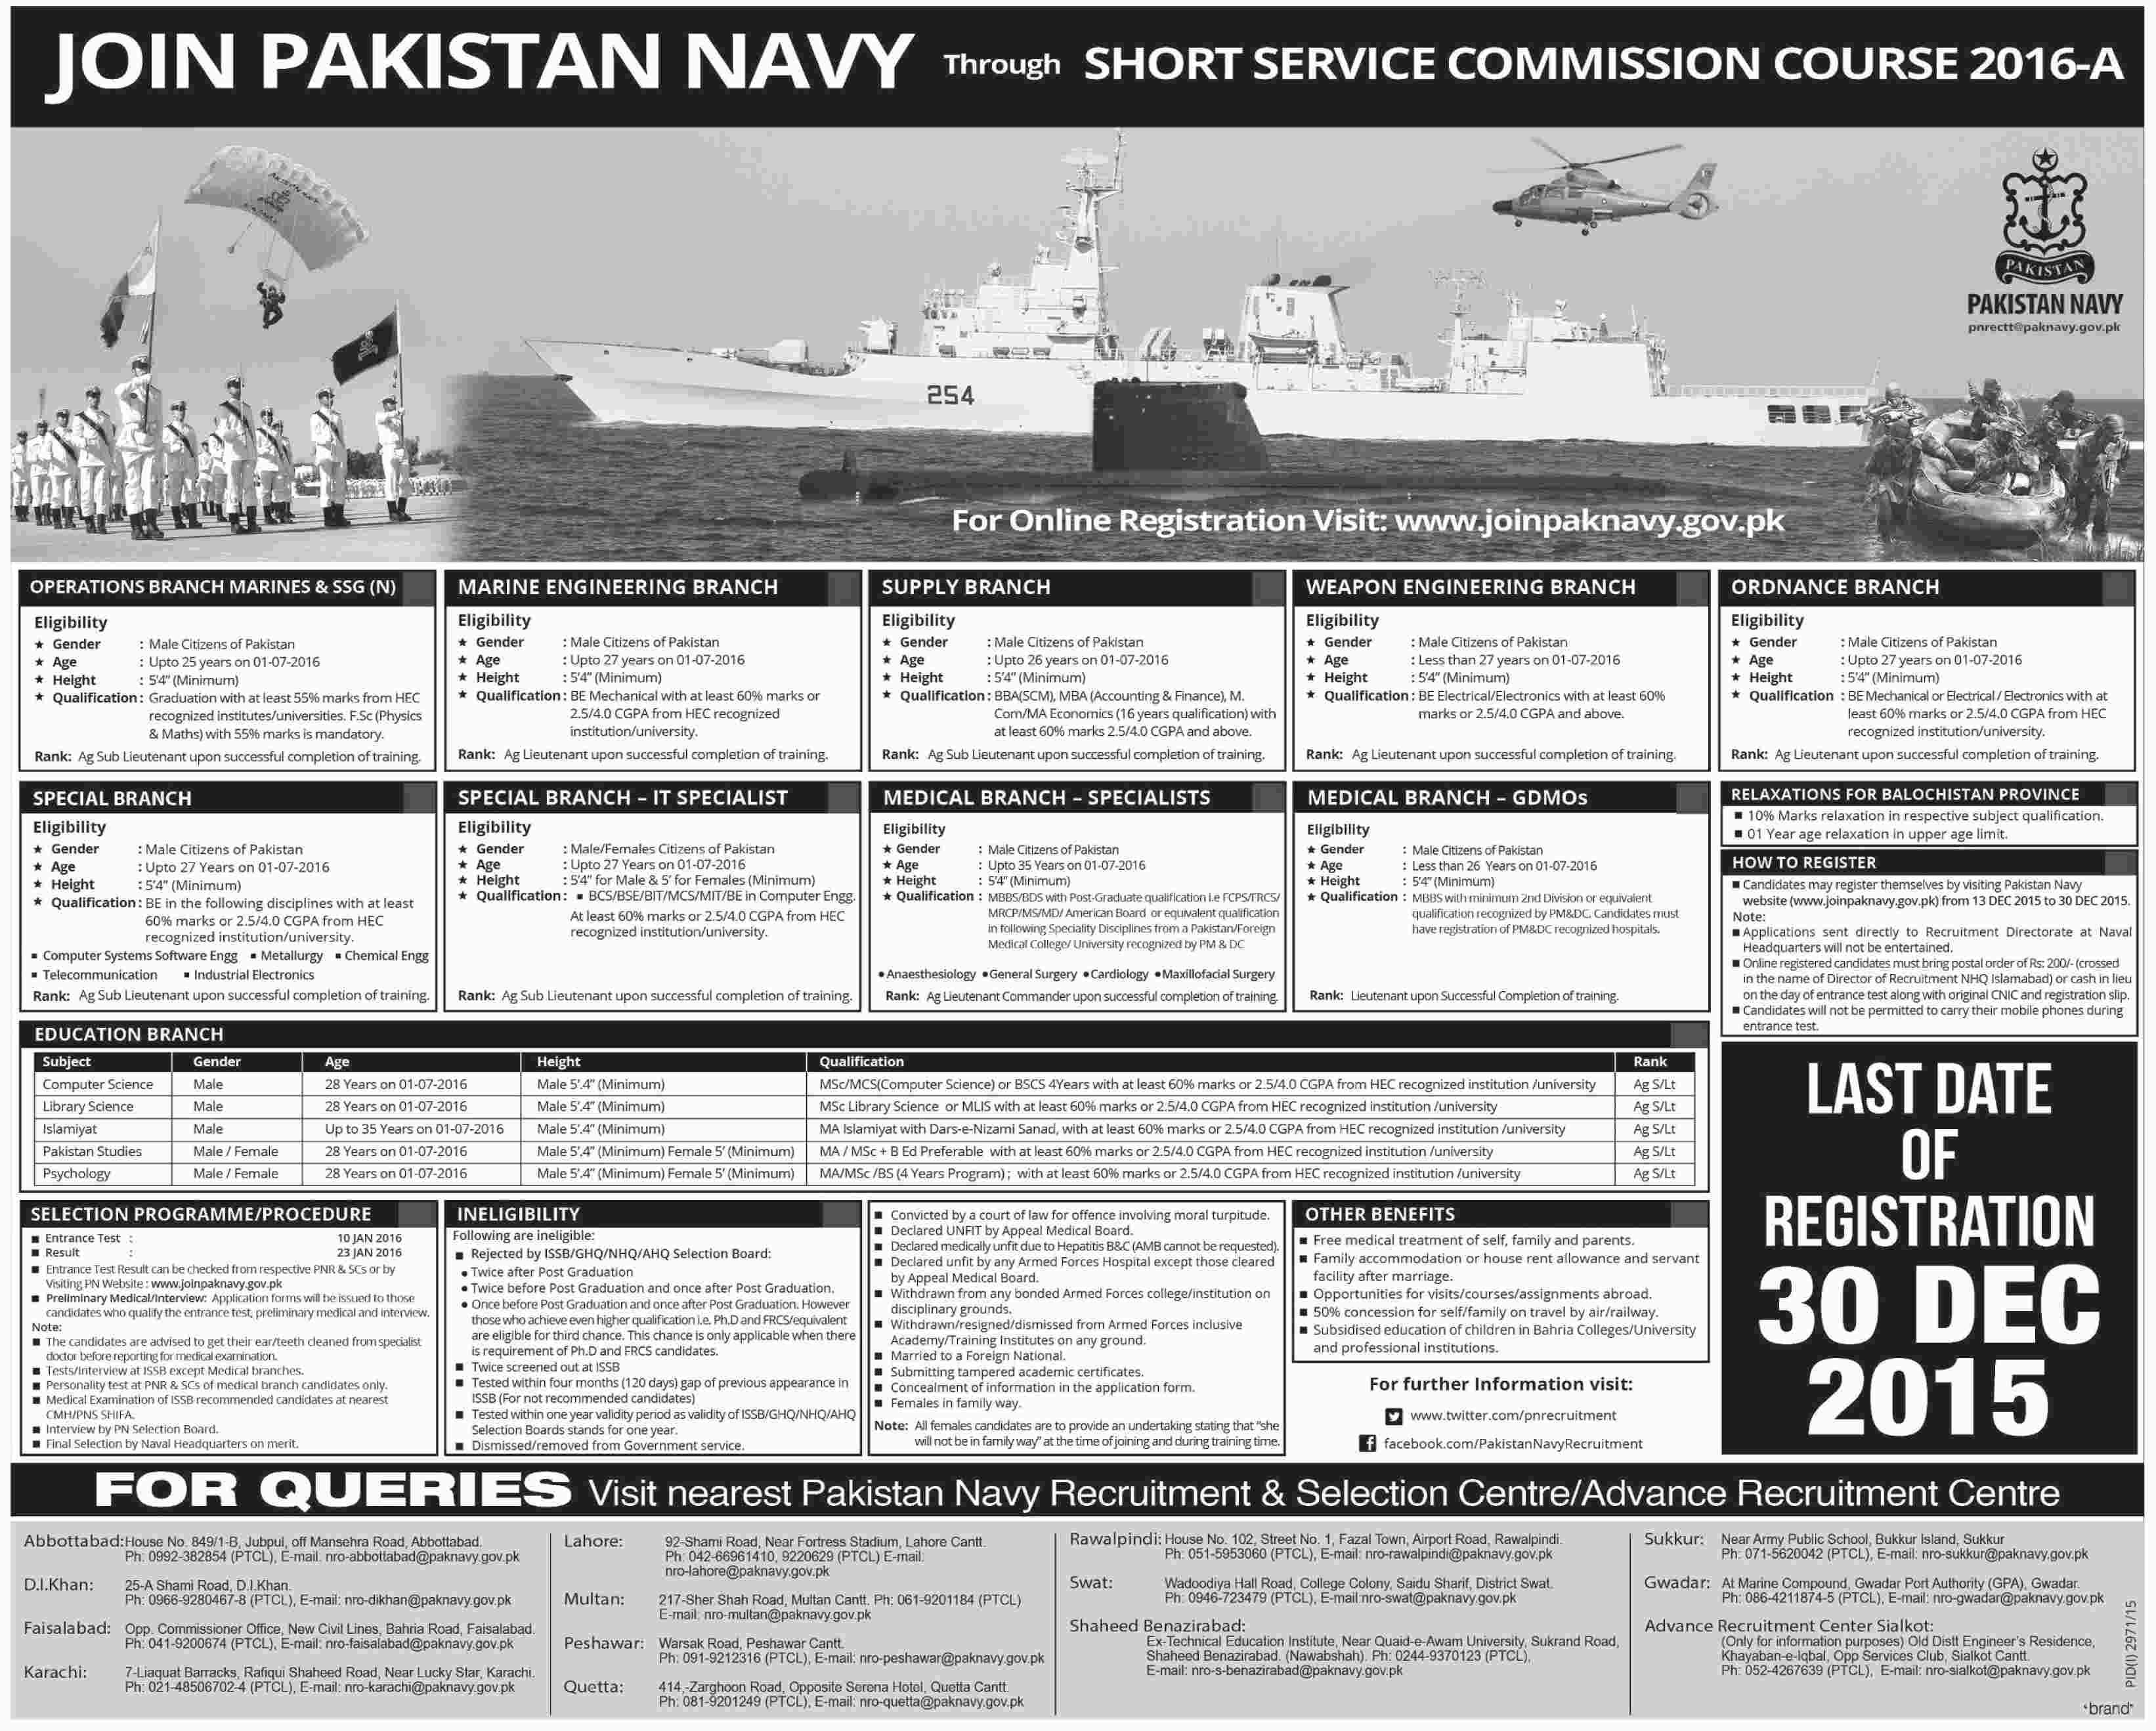 Pak Navy-Dawn-Dunya-Exp